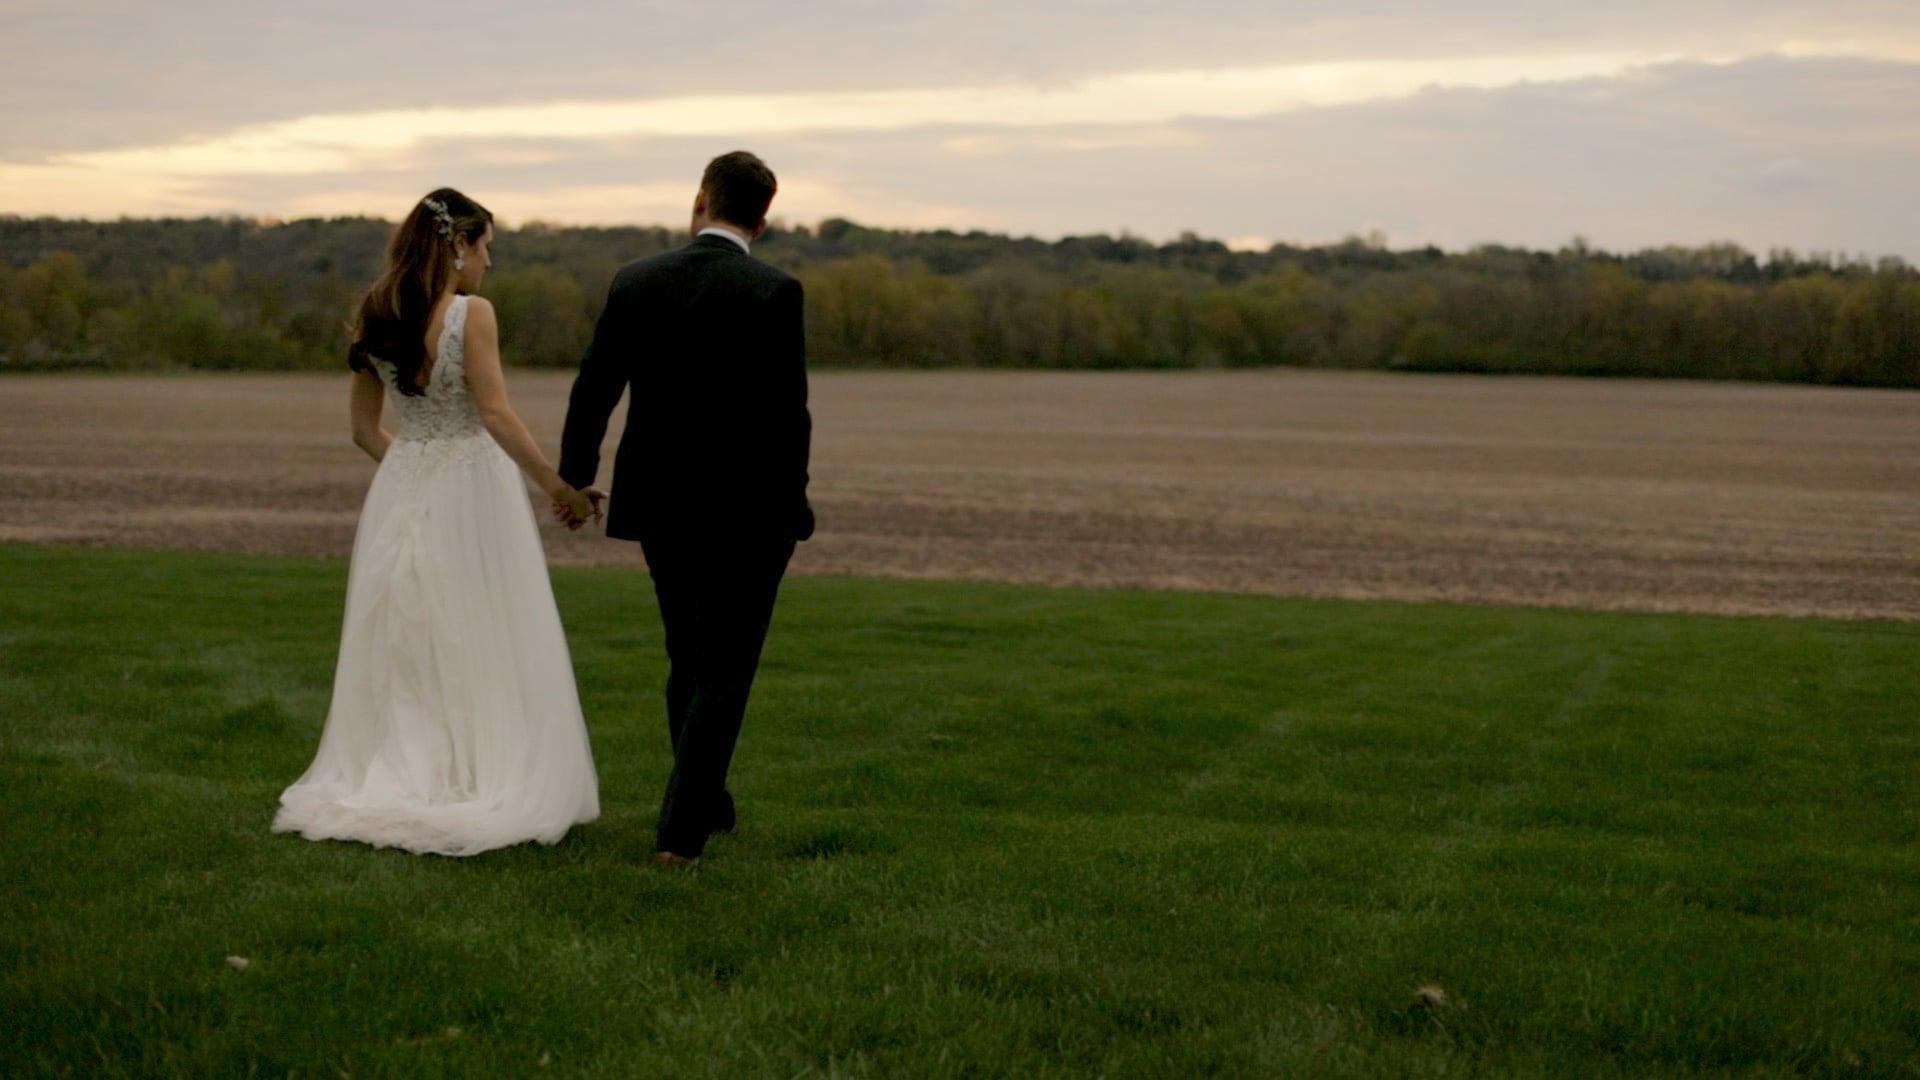 Matt + Jen | Rochester, Minnesota | Mayowood Stone Barn